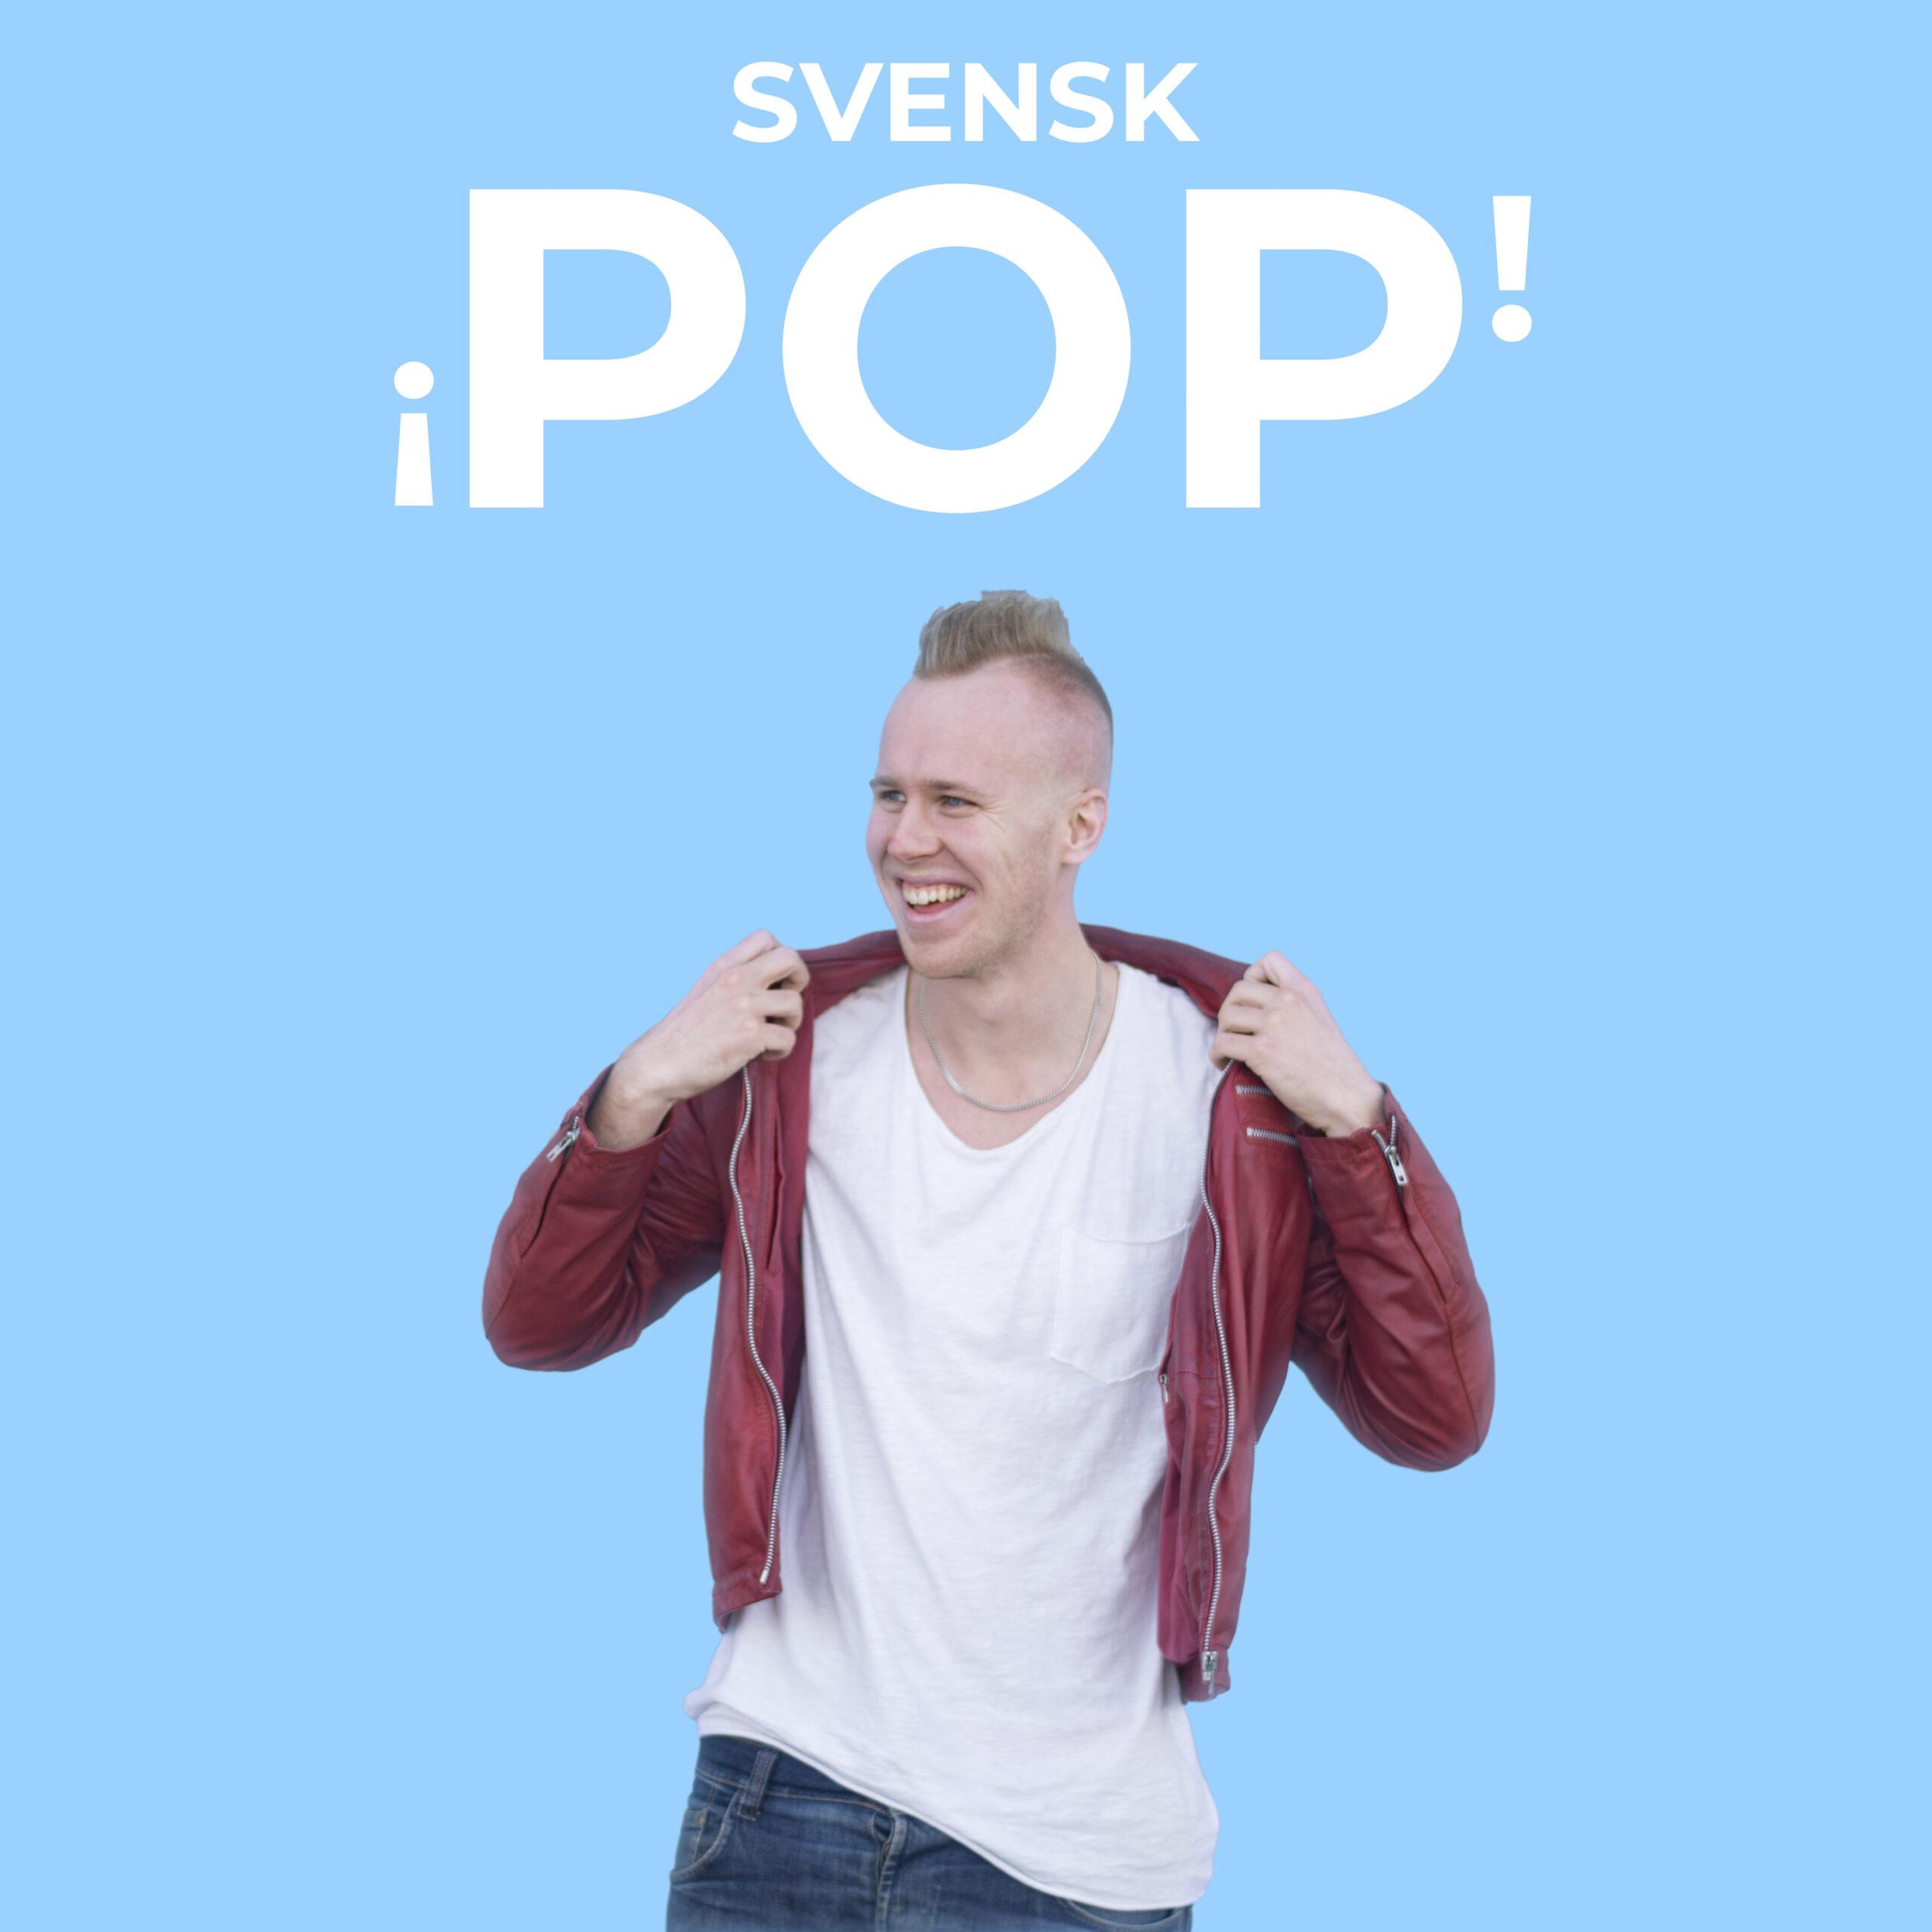 svensk pop spellista playlist